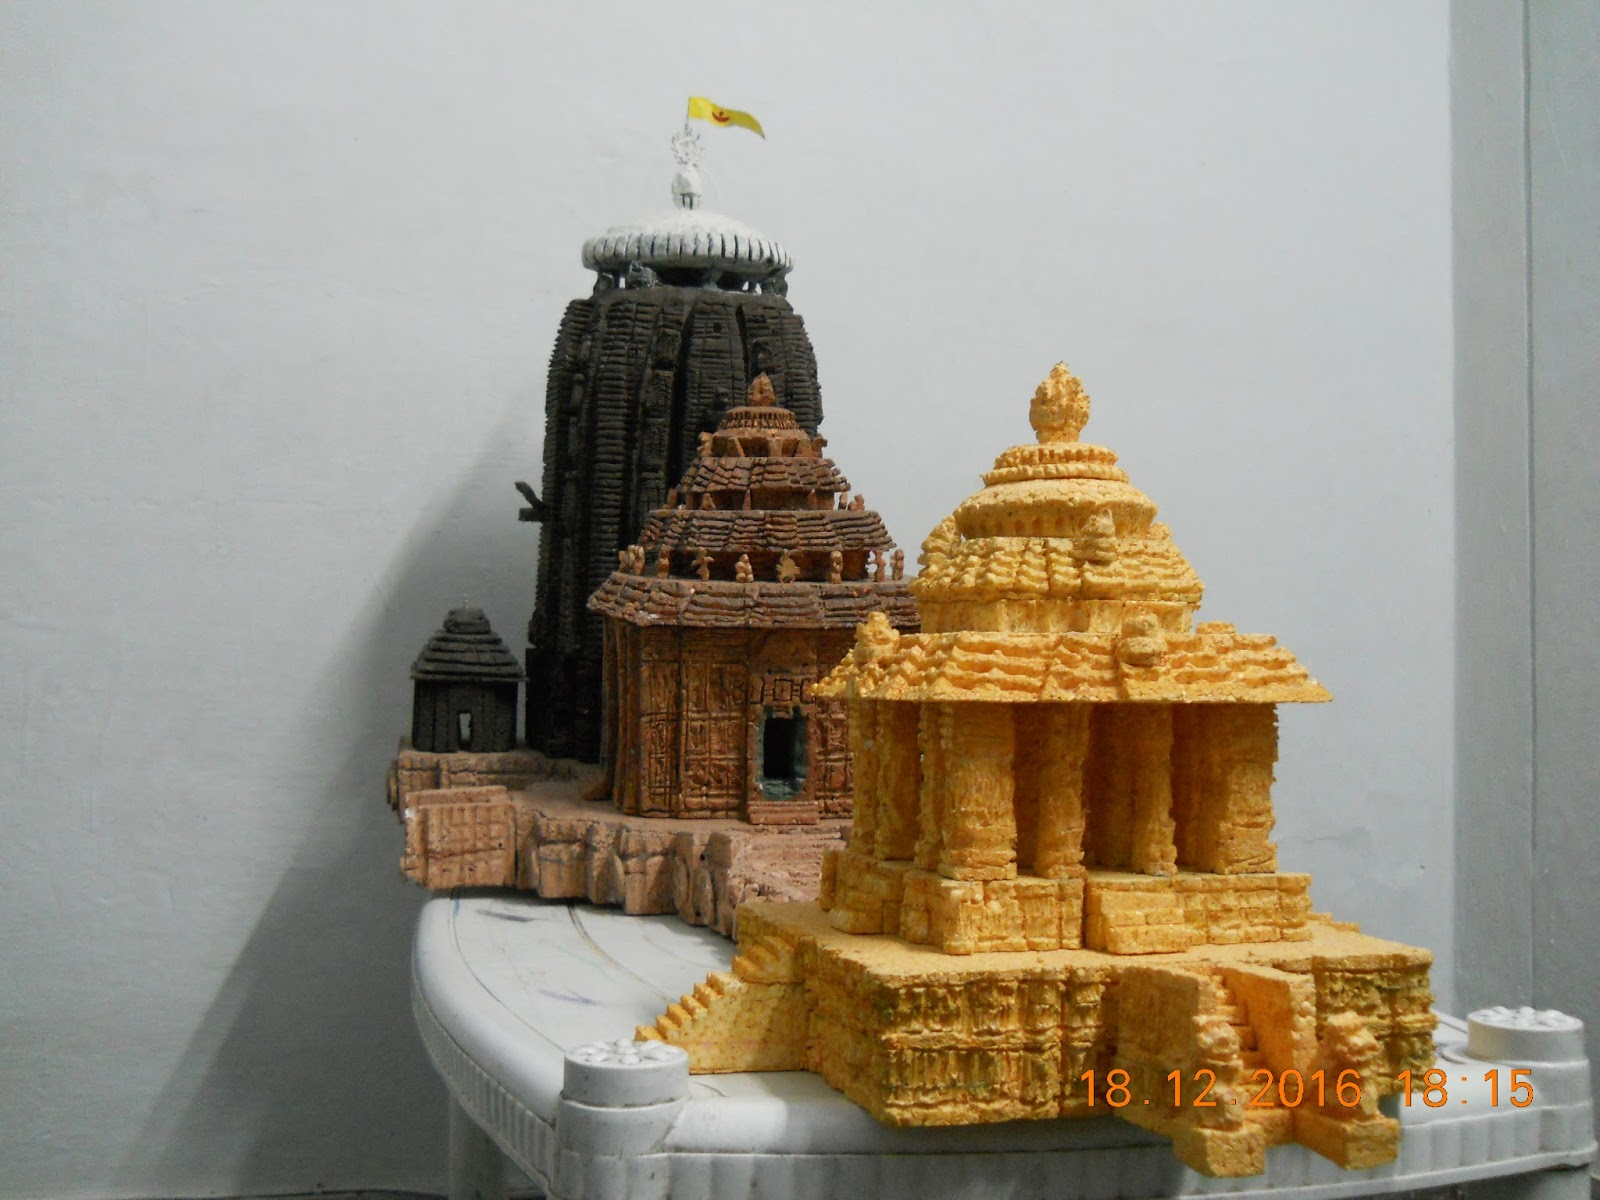 home made models: REPLICA OF SUN TEMPLE OF KONARK, ODISHA, INDIA